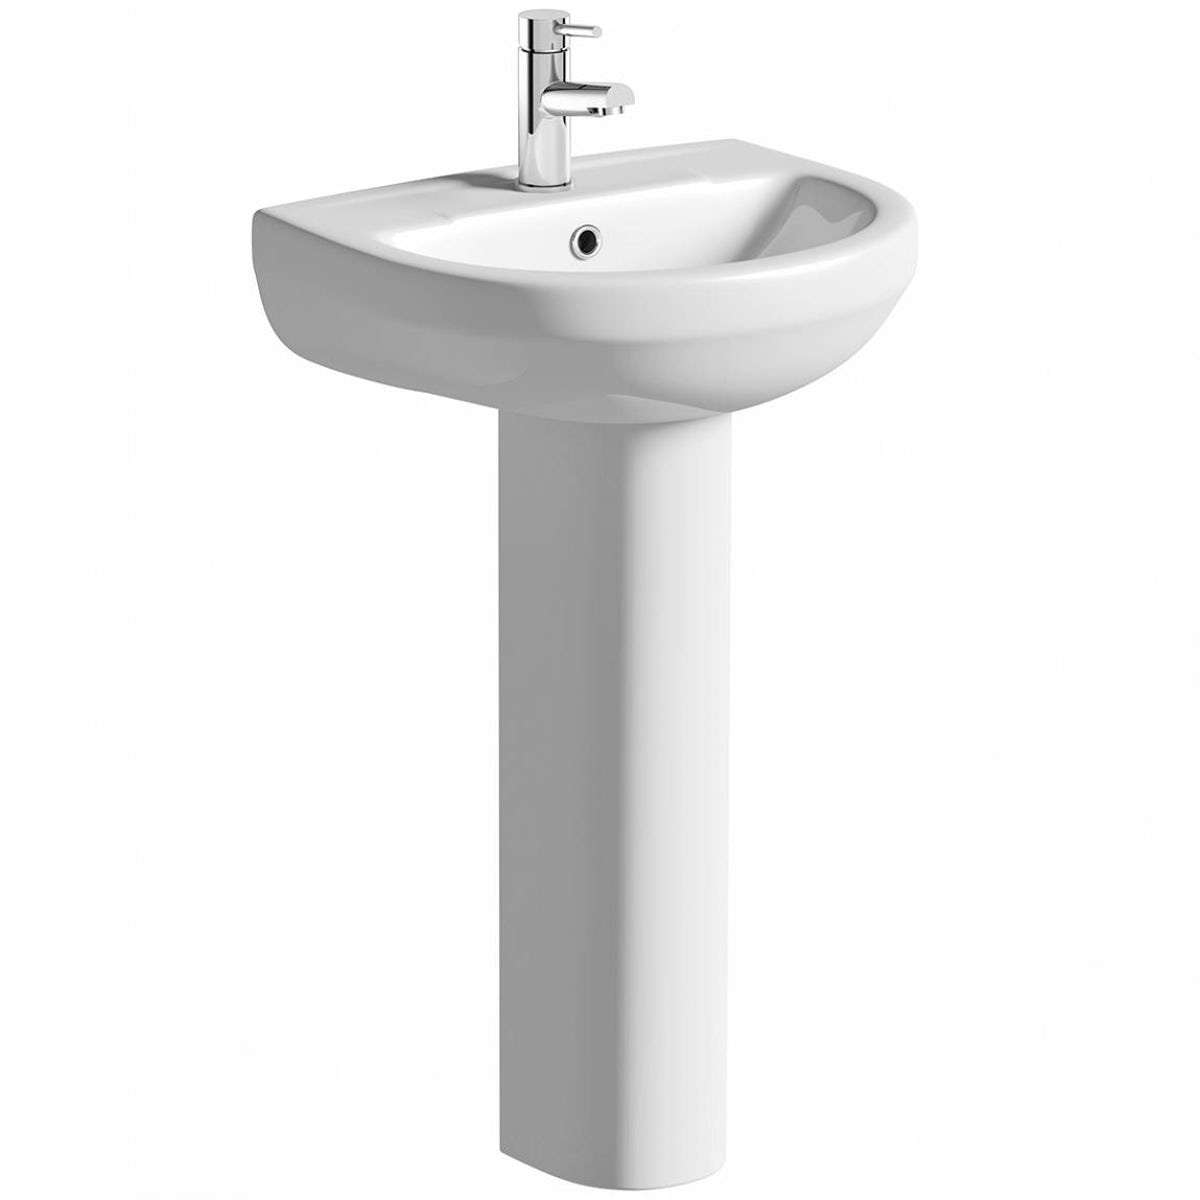 basin chat Matterley basin - returning  tim gajser – confidence building gautier paulin  #flashbackfriday to the 2016 mxgp of great britain with winner tim gajser.